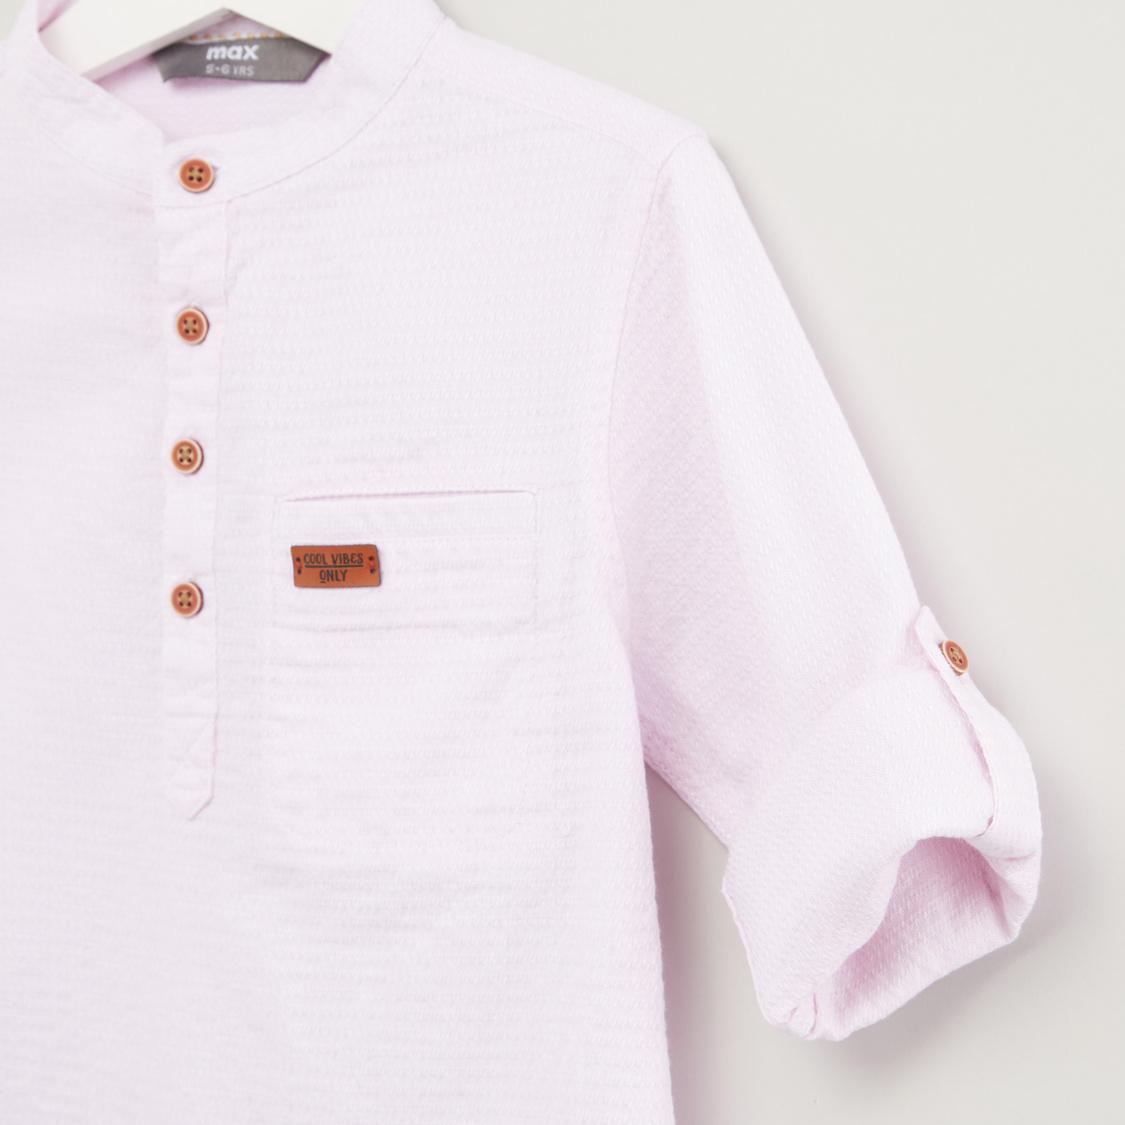 Plain Shirt with Mandarin Collar and Long Sleeves